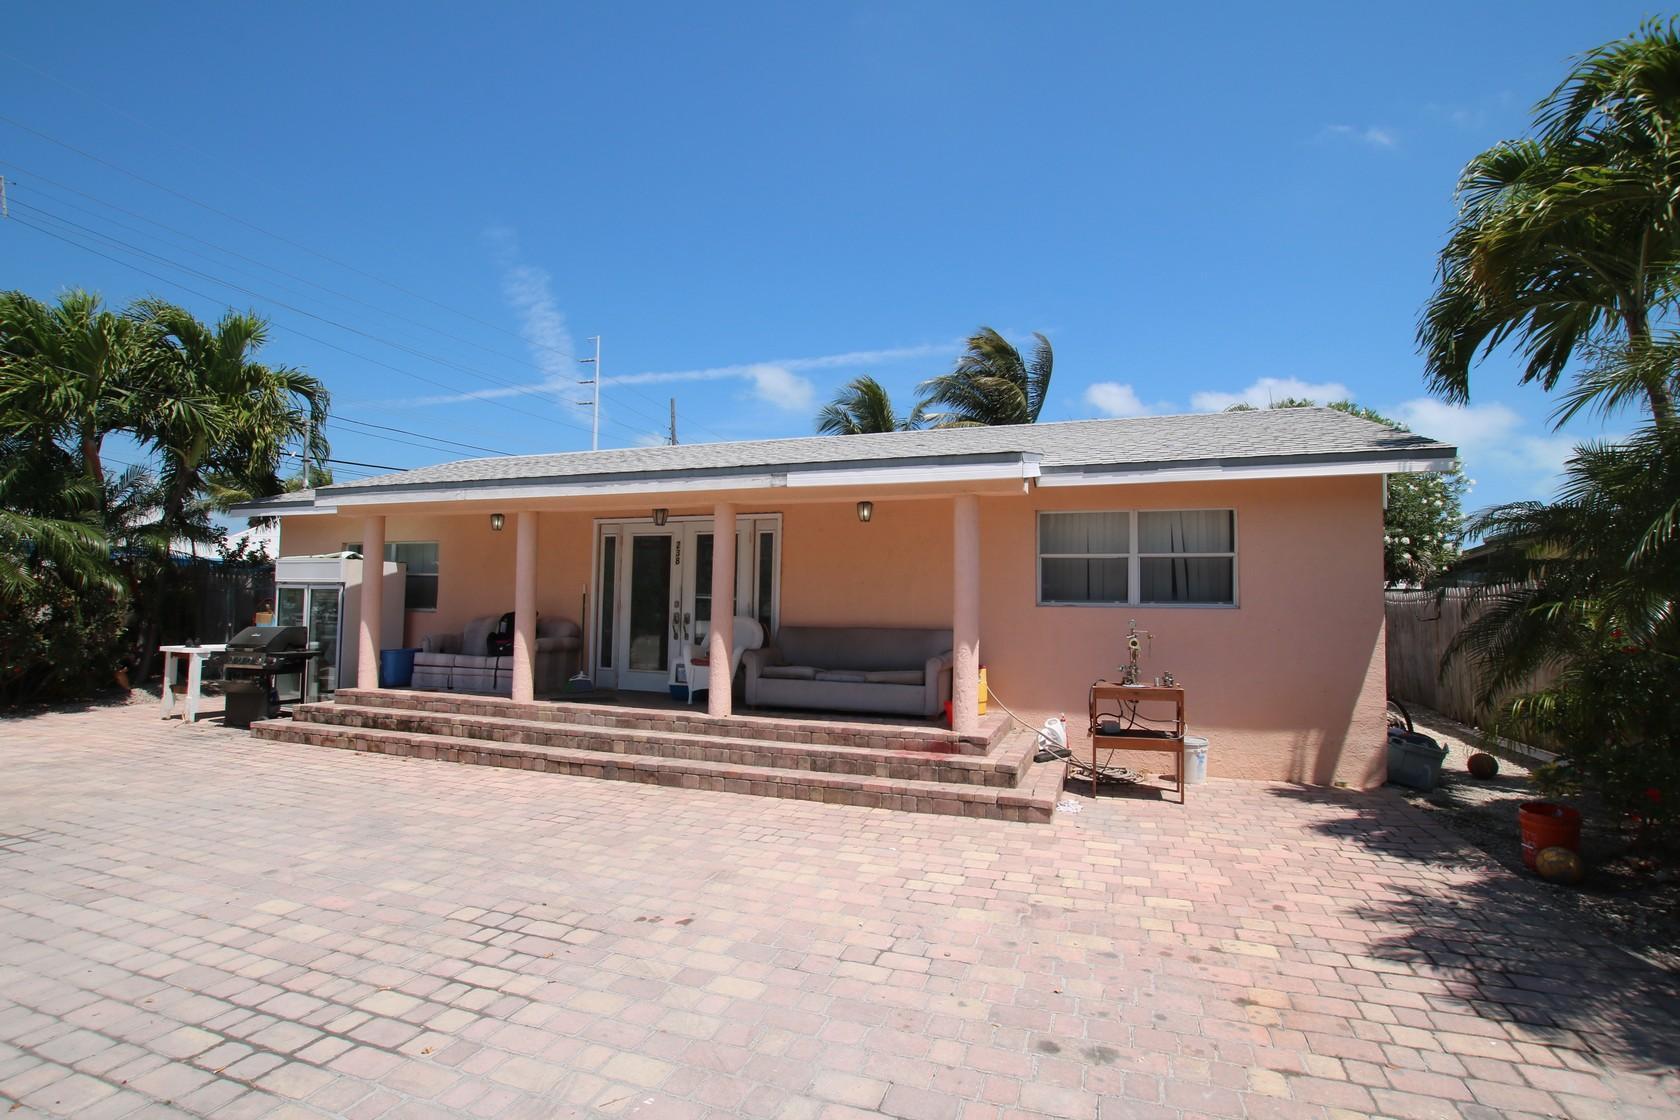 238 109Th Street Ocean Street Ocean MARATHON, FL 33050 575065